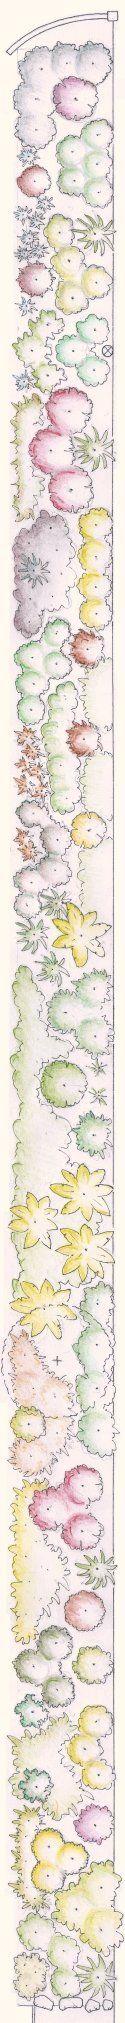 Design Portfolio - 14 - Coastal NZ native planting plan